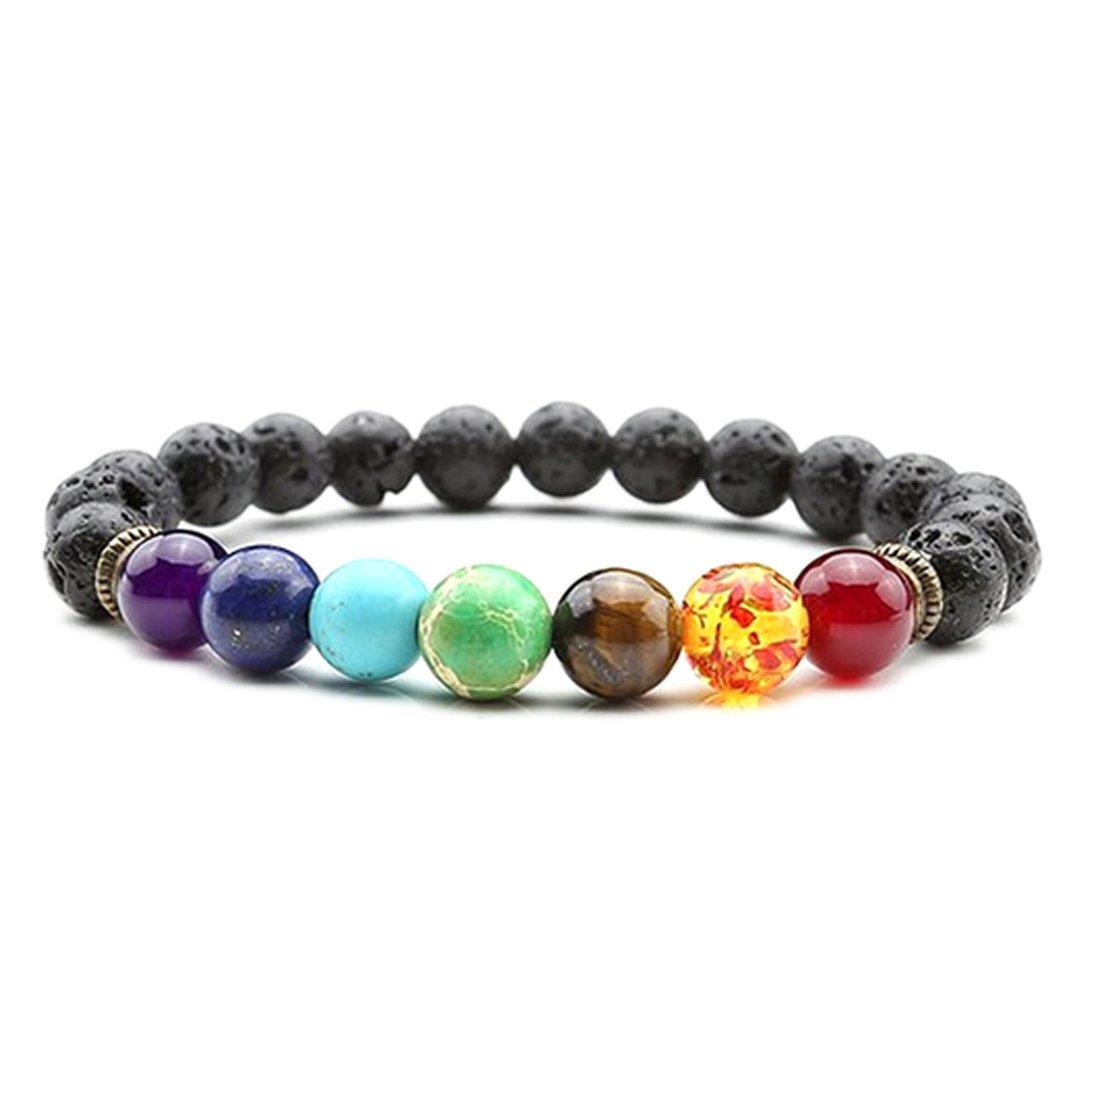 7 Chakra Healing Lava Bracelet Free Ship Deal